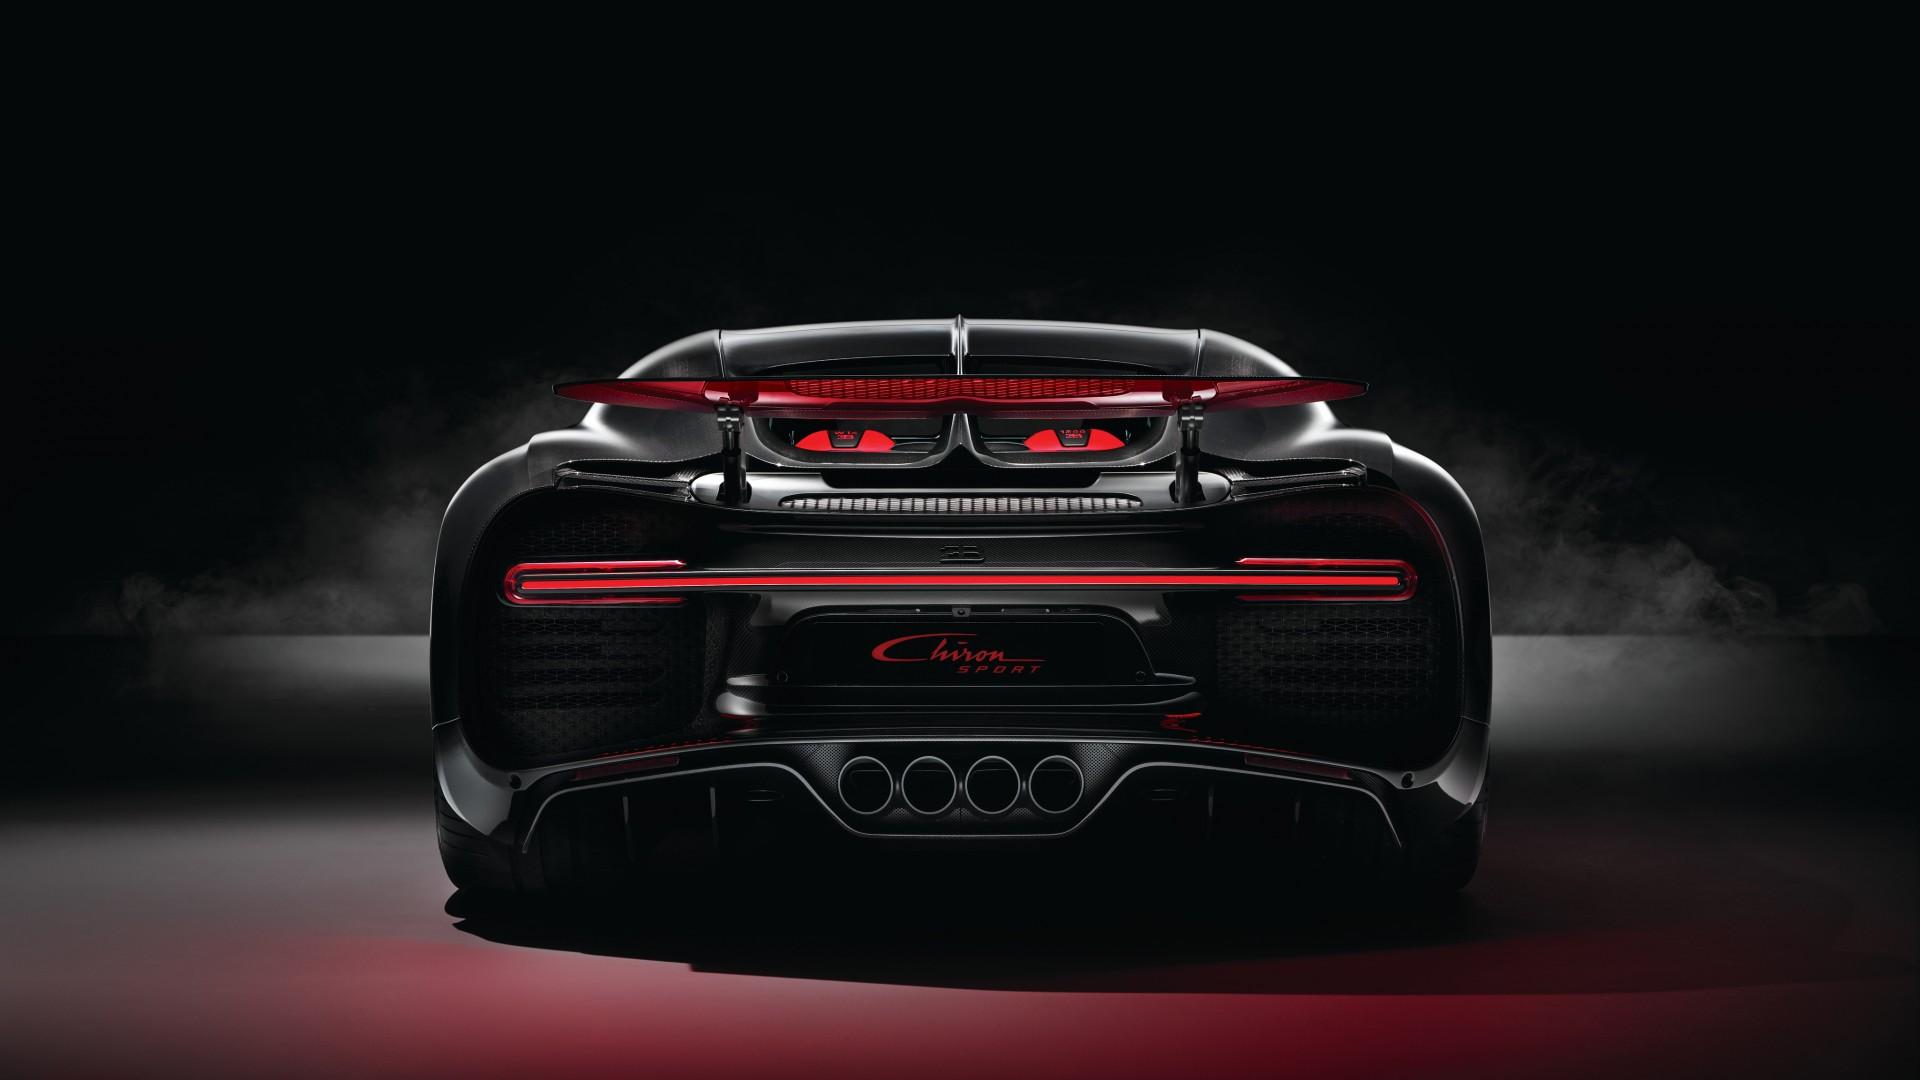 Latest Car Wallpaper 2014 2018 Bugatti Chiron Sport 4k Wallpaper Hd Car Wallpapers